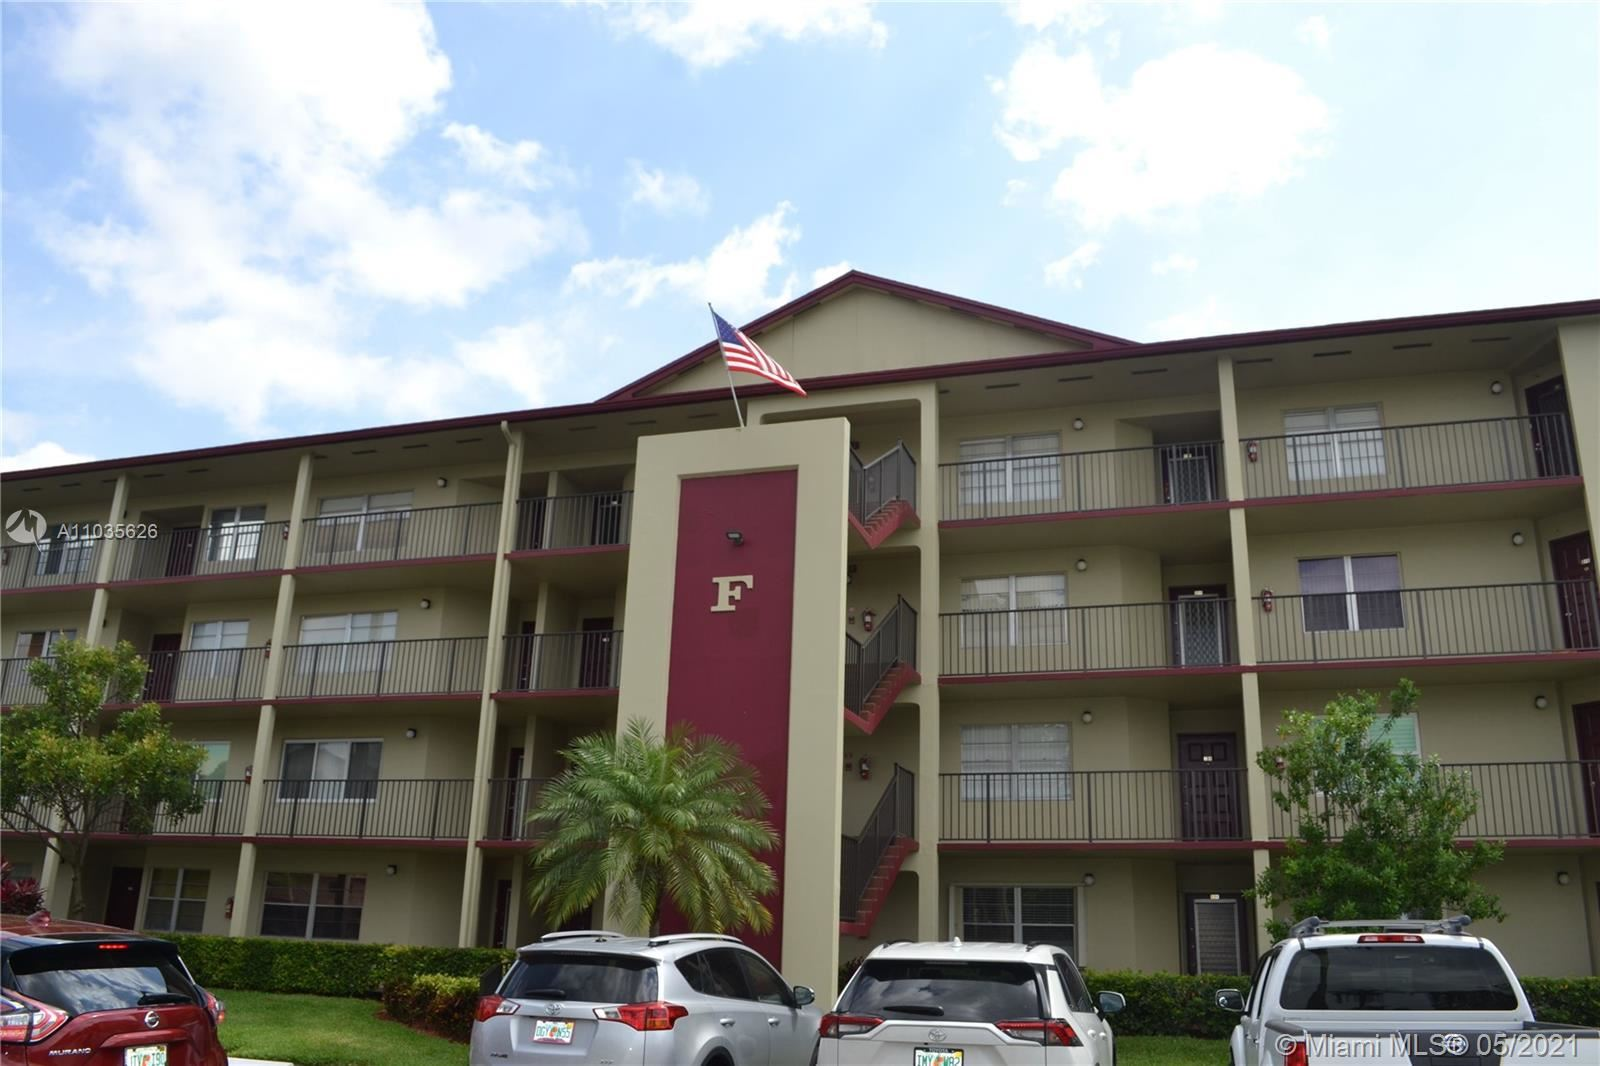 701 SW 128th Ave #207F, Pembroke Pines, FL 33027 - #: A11035626